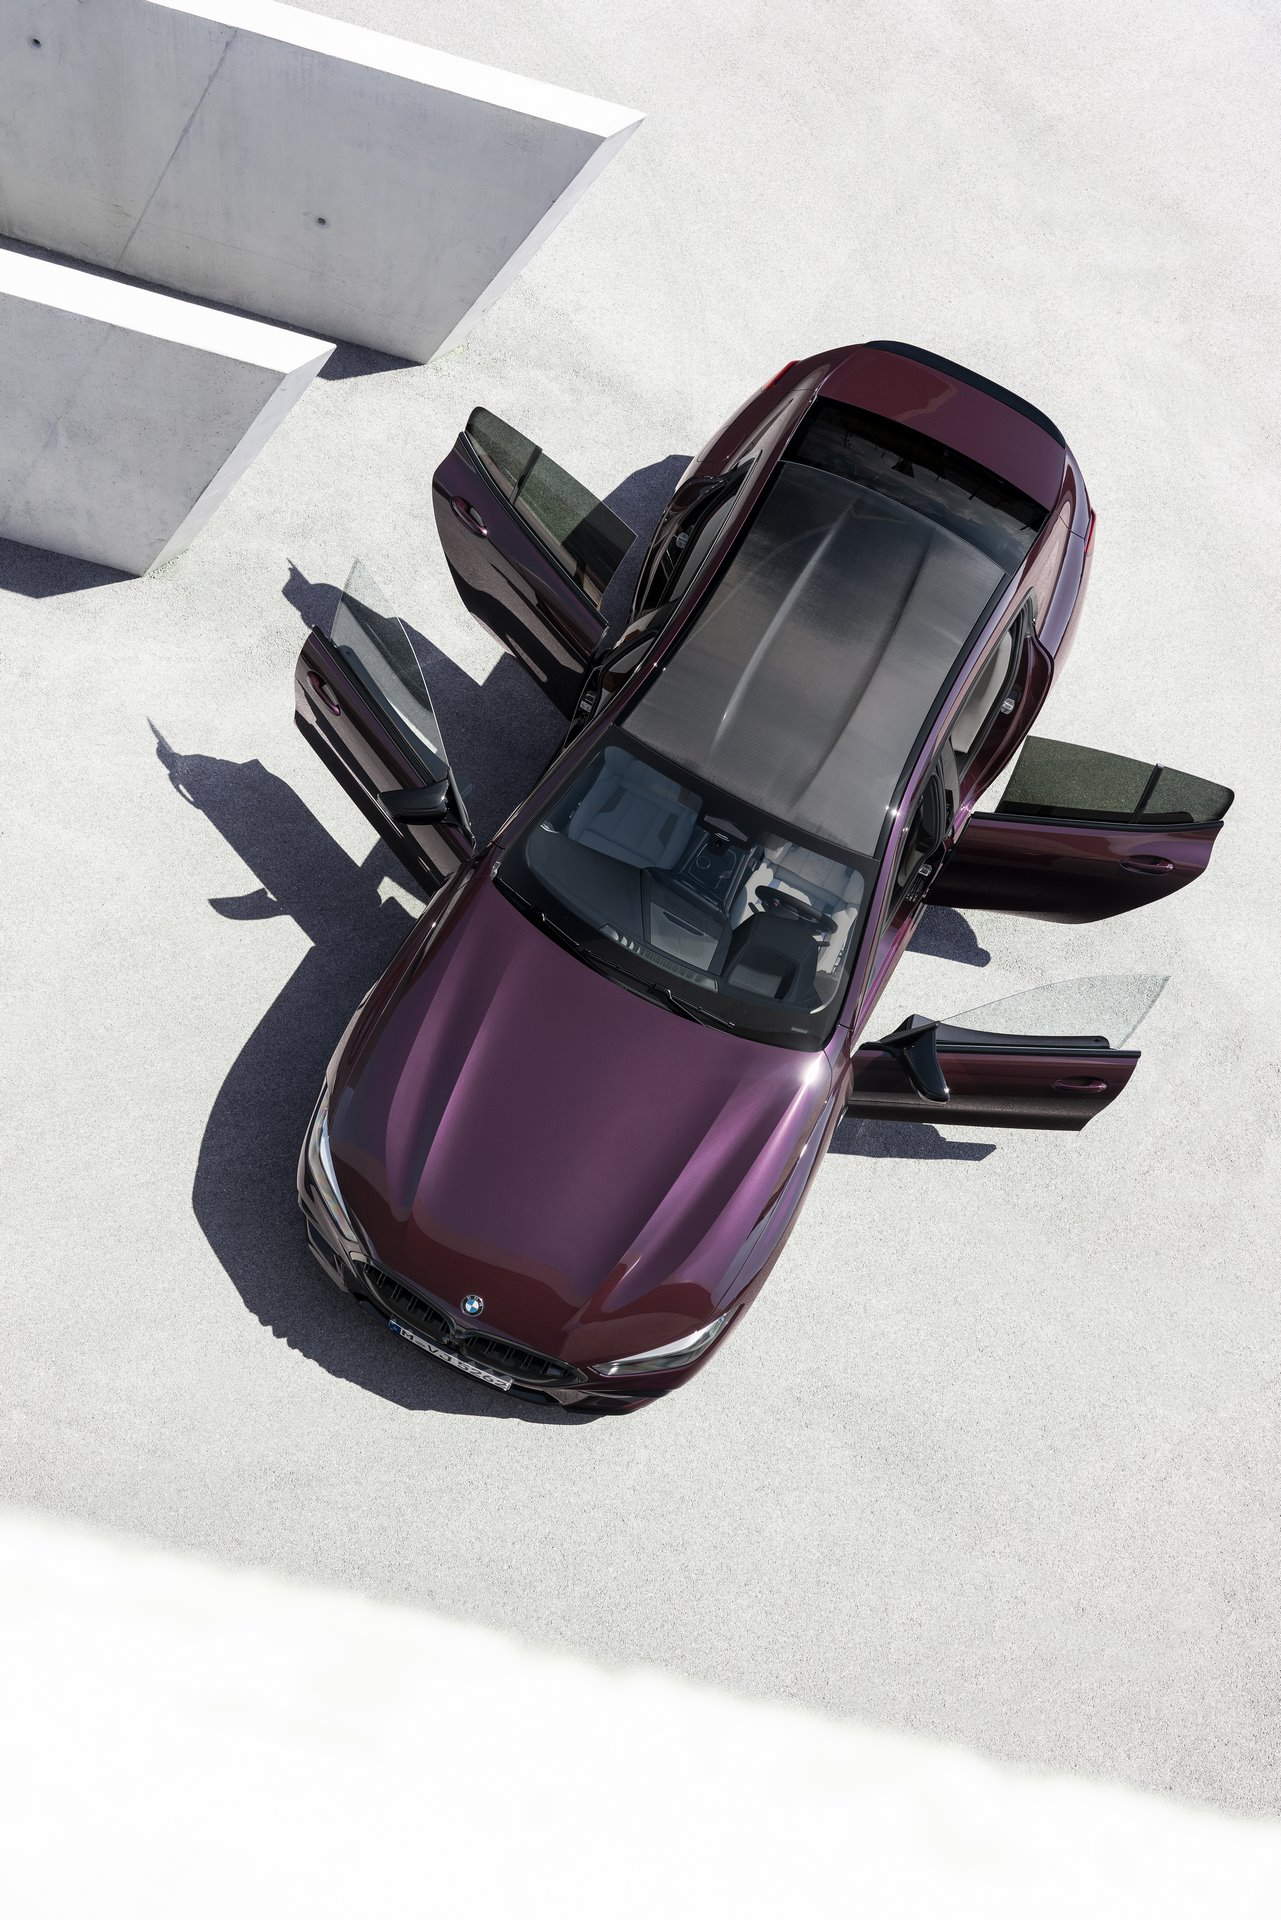 BMW-M8-Gran-Coupe-2020-67